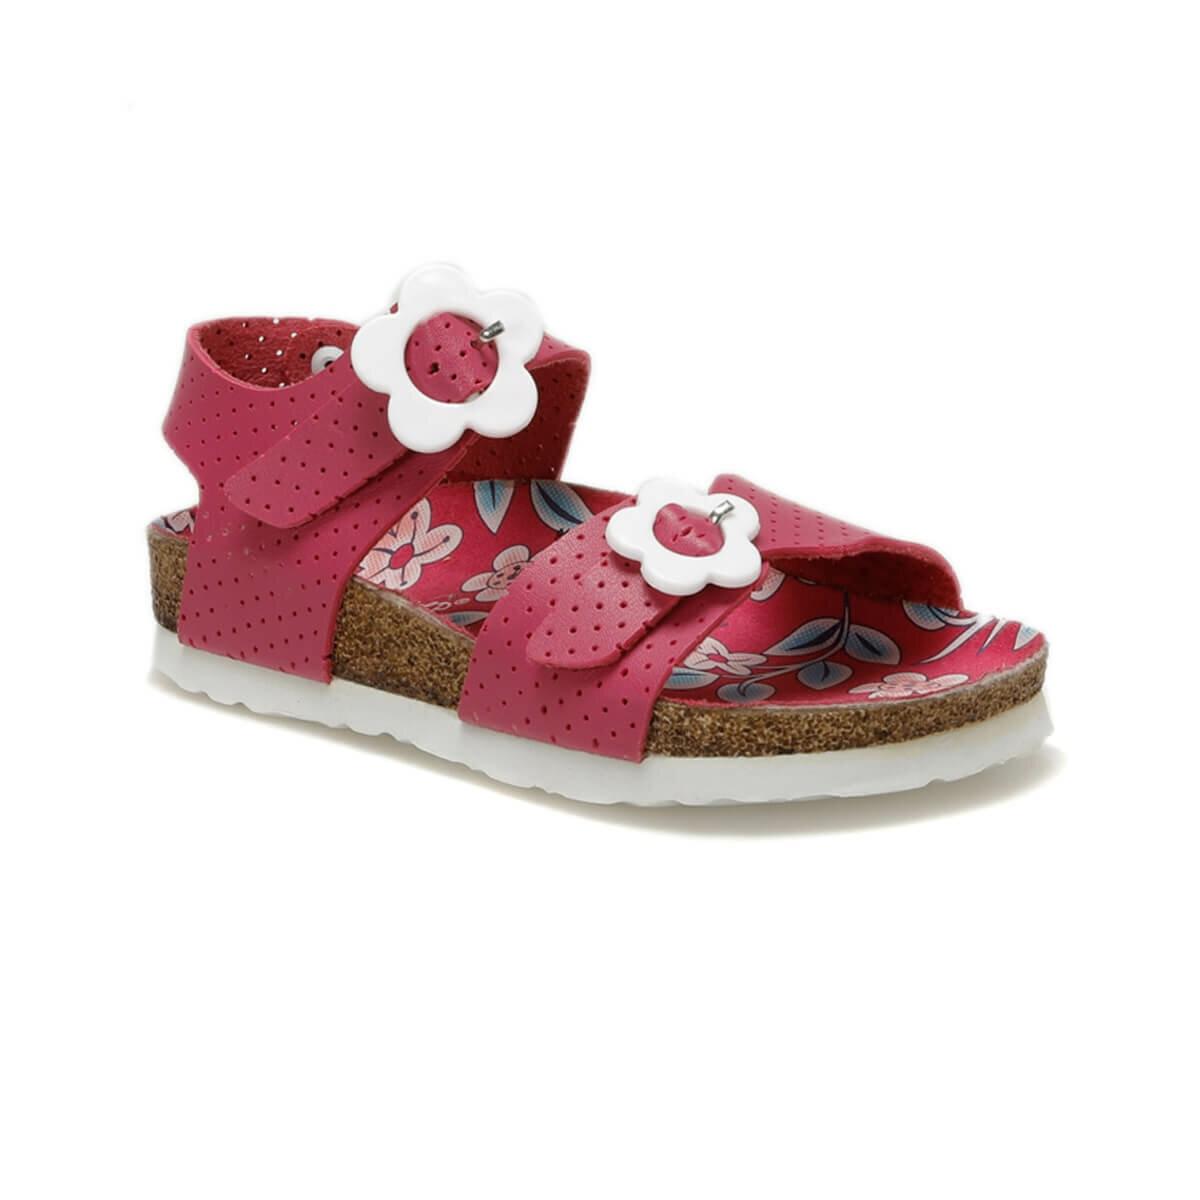 FLO 91. YUNDY. P Fuchsia Girls Child Sandals PINKSTEP